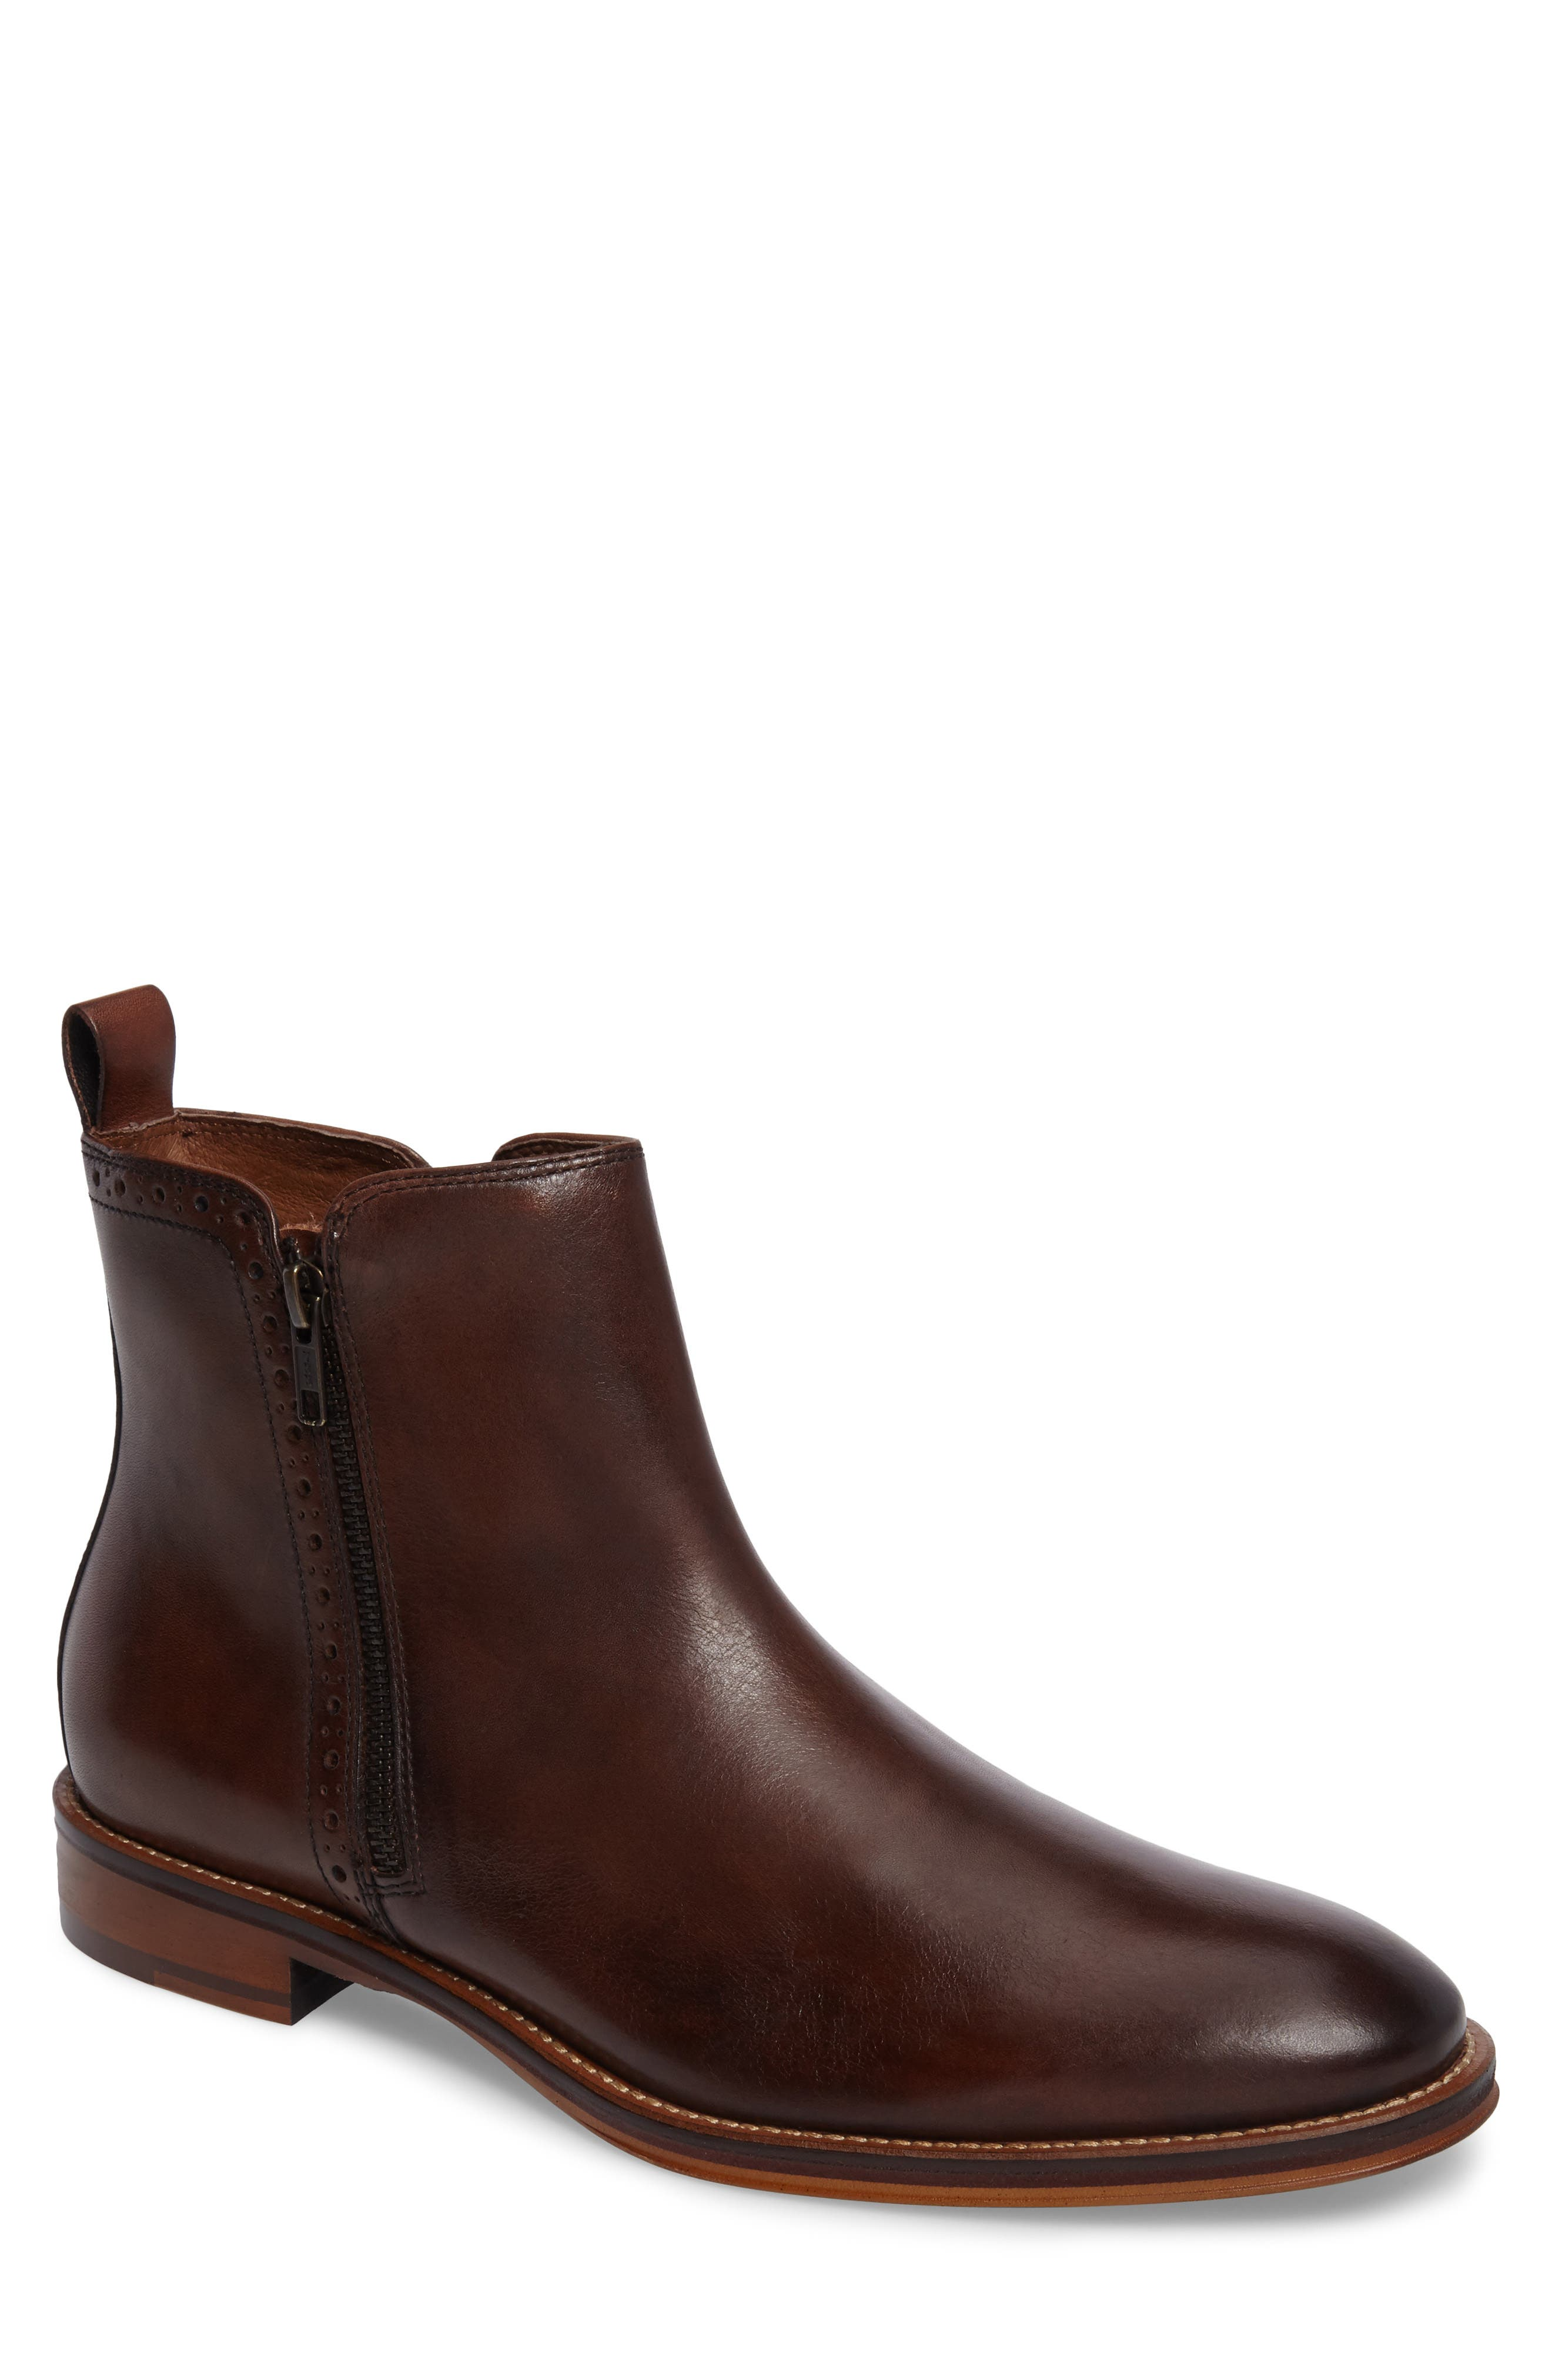 Johnston & Murphy Conard Boot, Brown